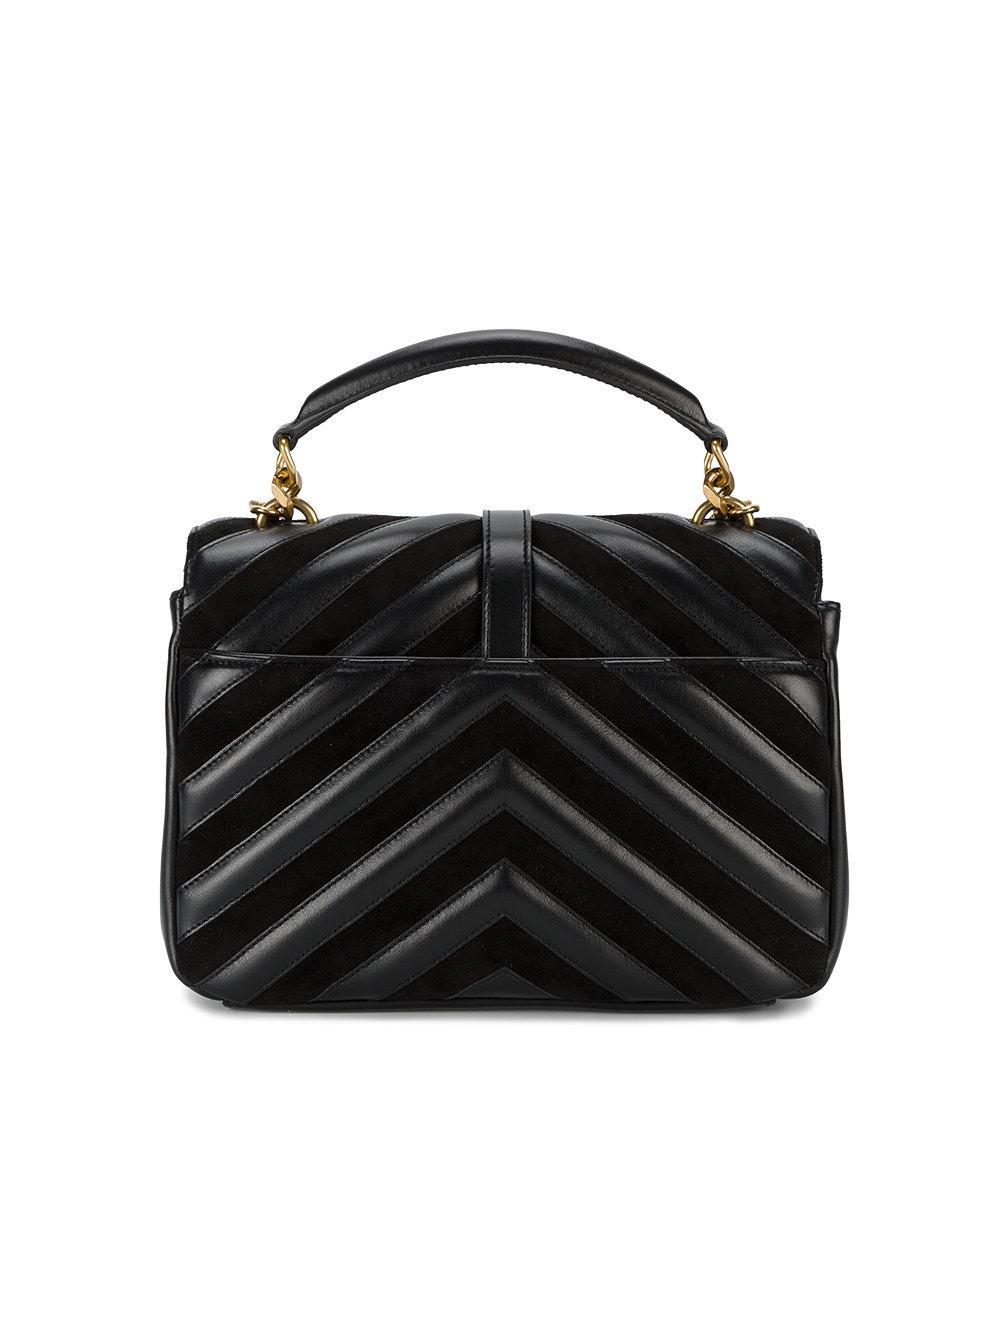 1272cd79f913 Lyst - Saint Laurent Medium Black Leather Collège Monogram Shoulder ...